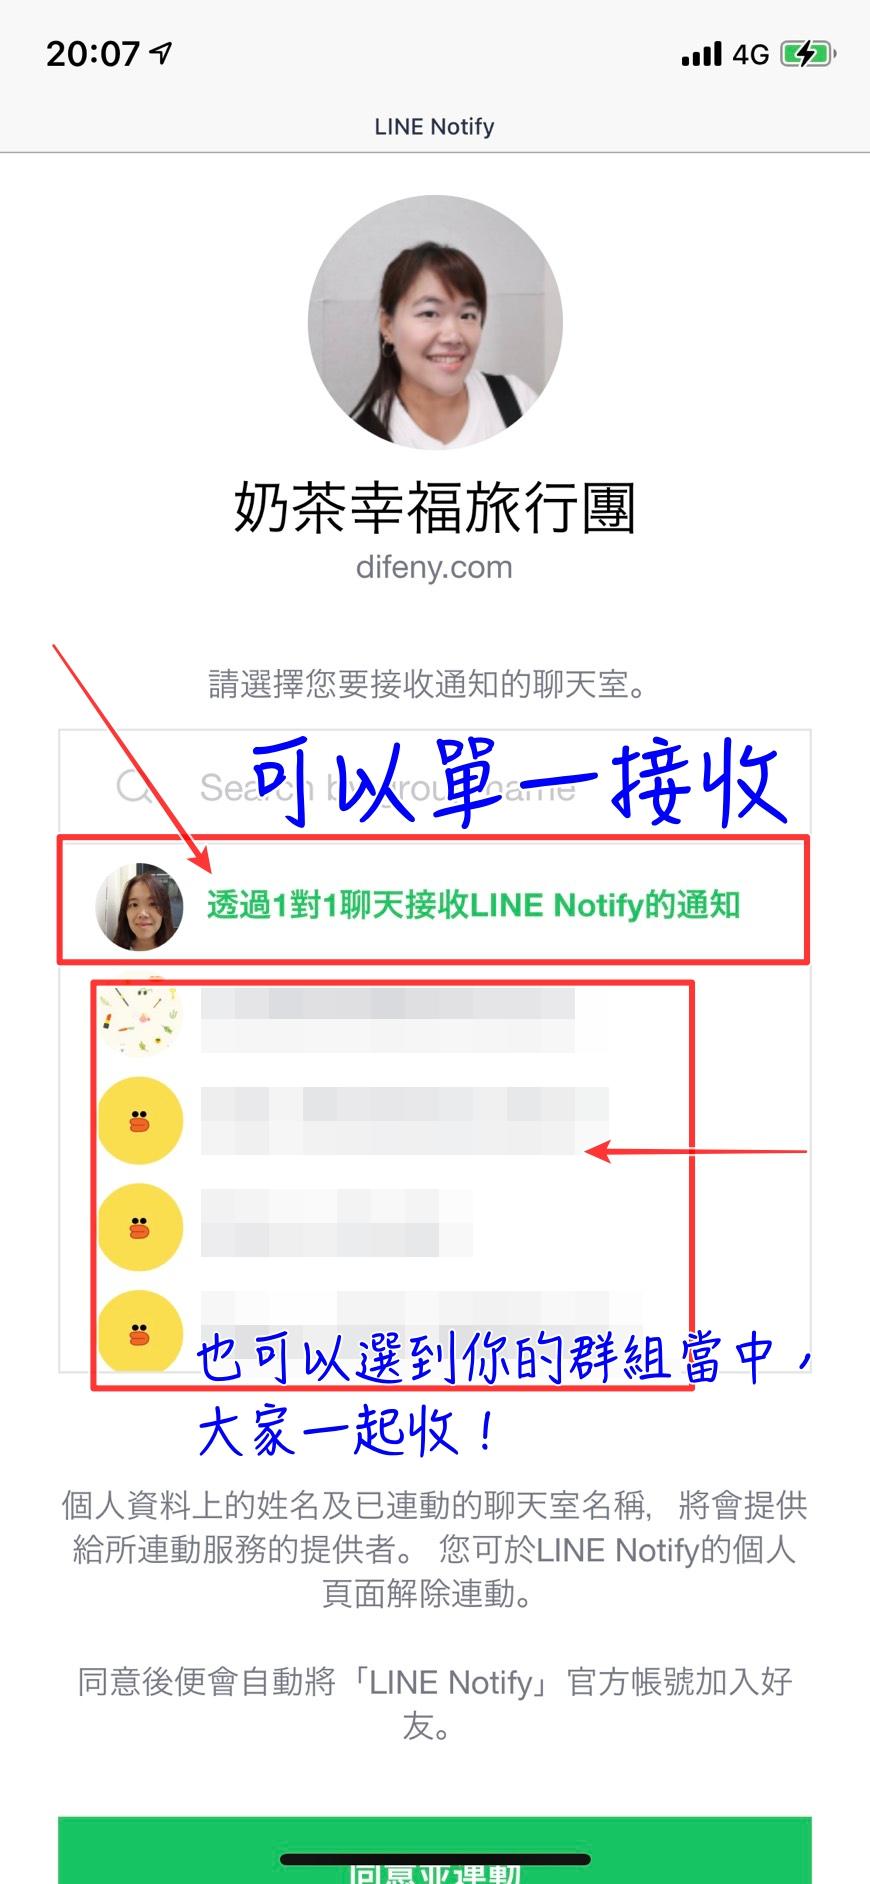 Line 推播小鬧鈴,Notify~奶茶幸福旅行團推播訊息重新再來~